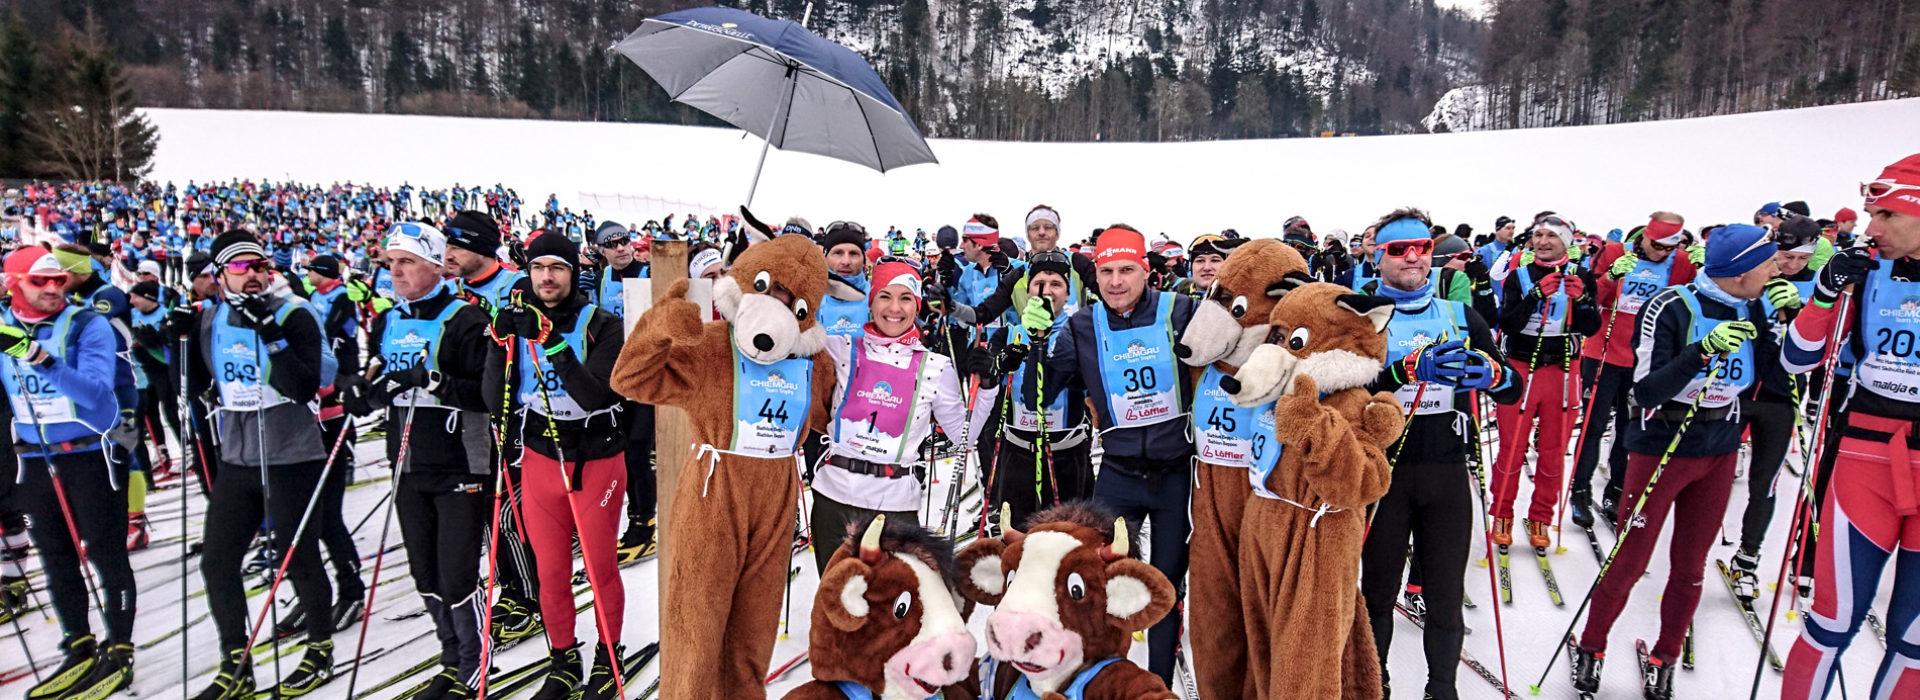 Chiemgau Team Trophy 2019 - news, events